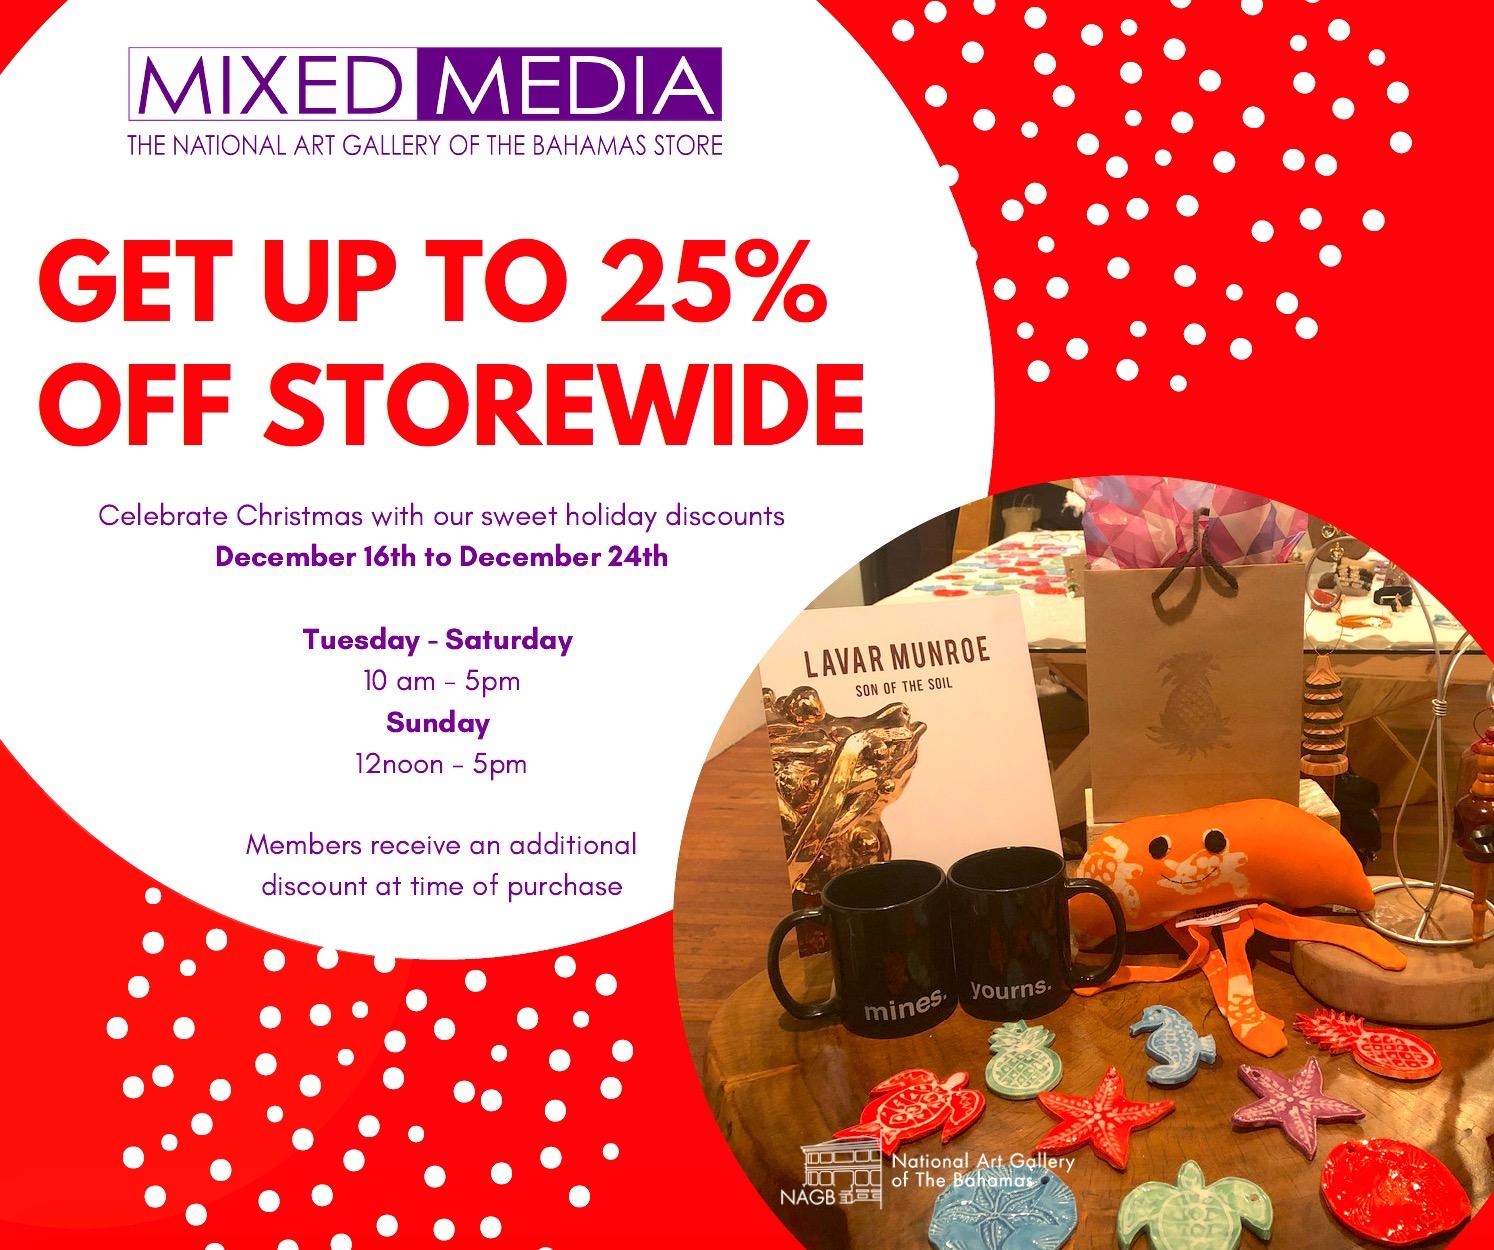 Mixed Media Store Discount.jpg